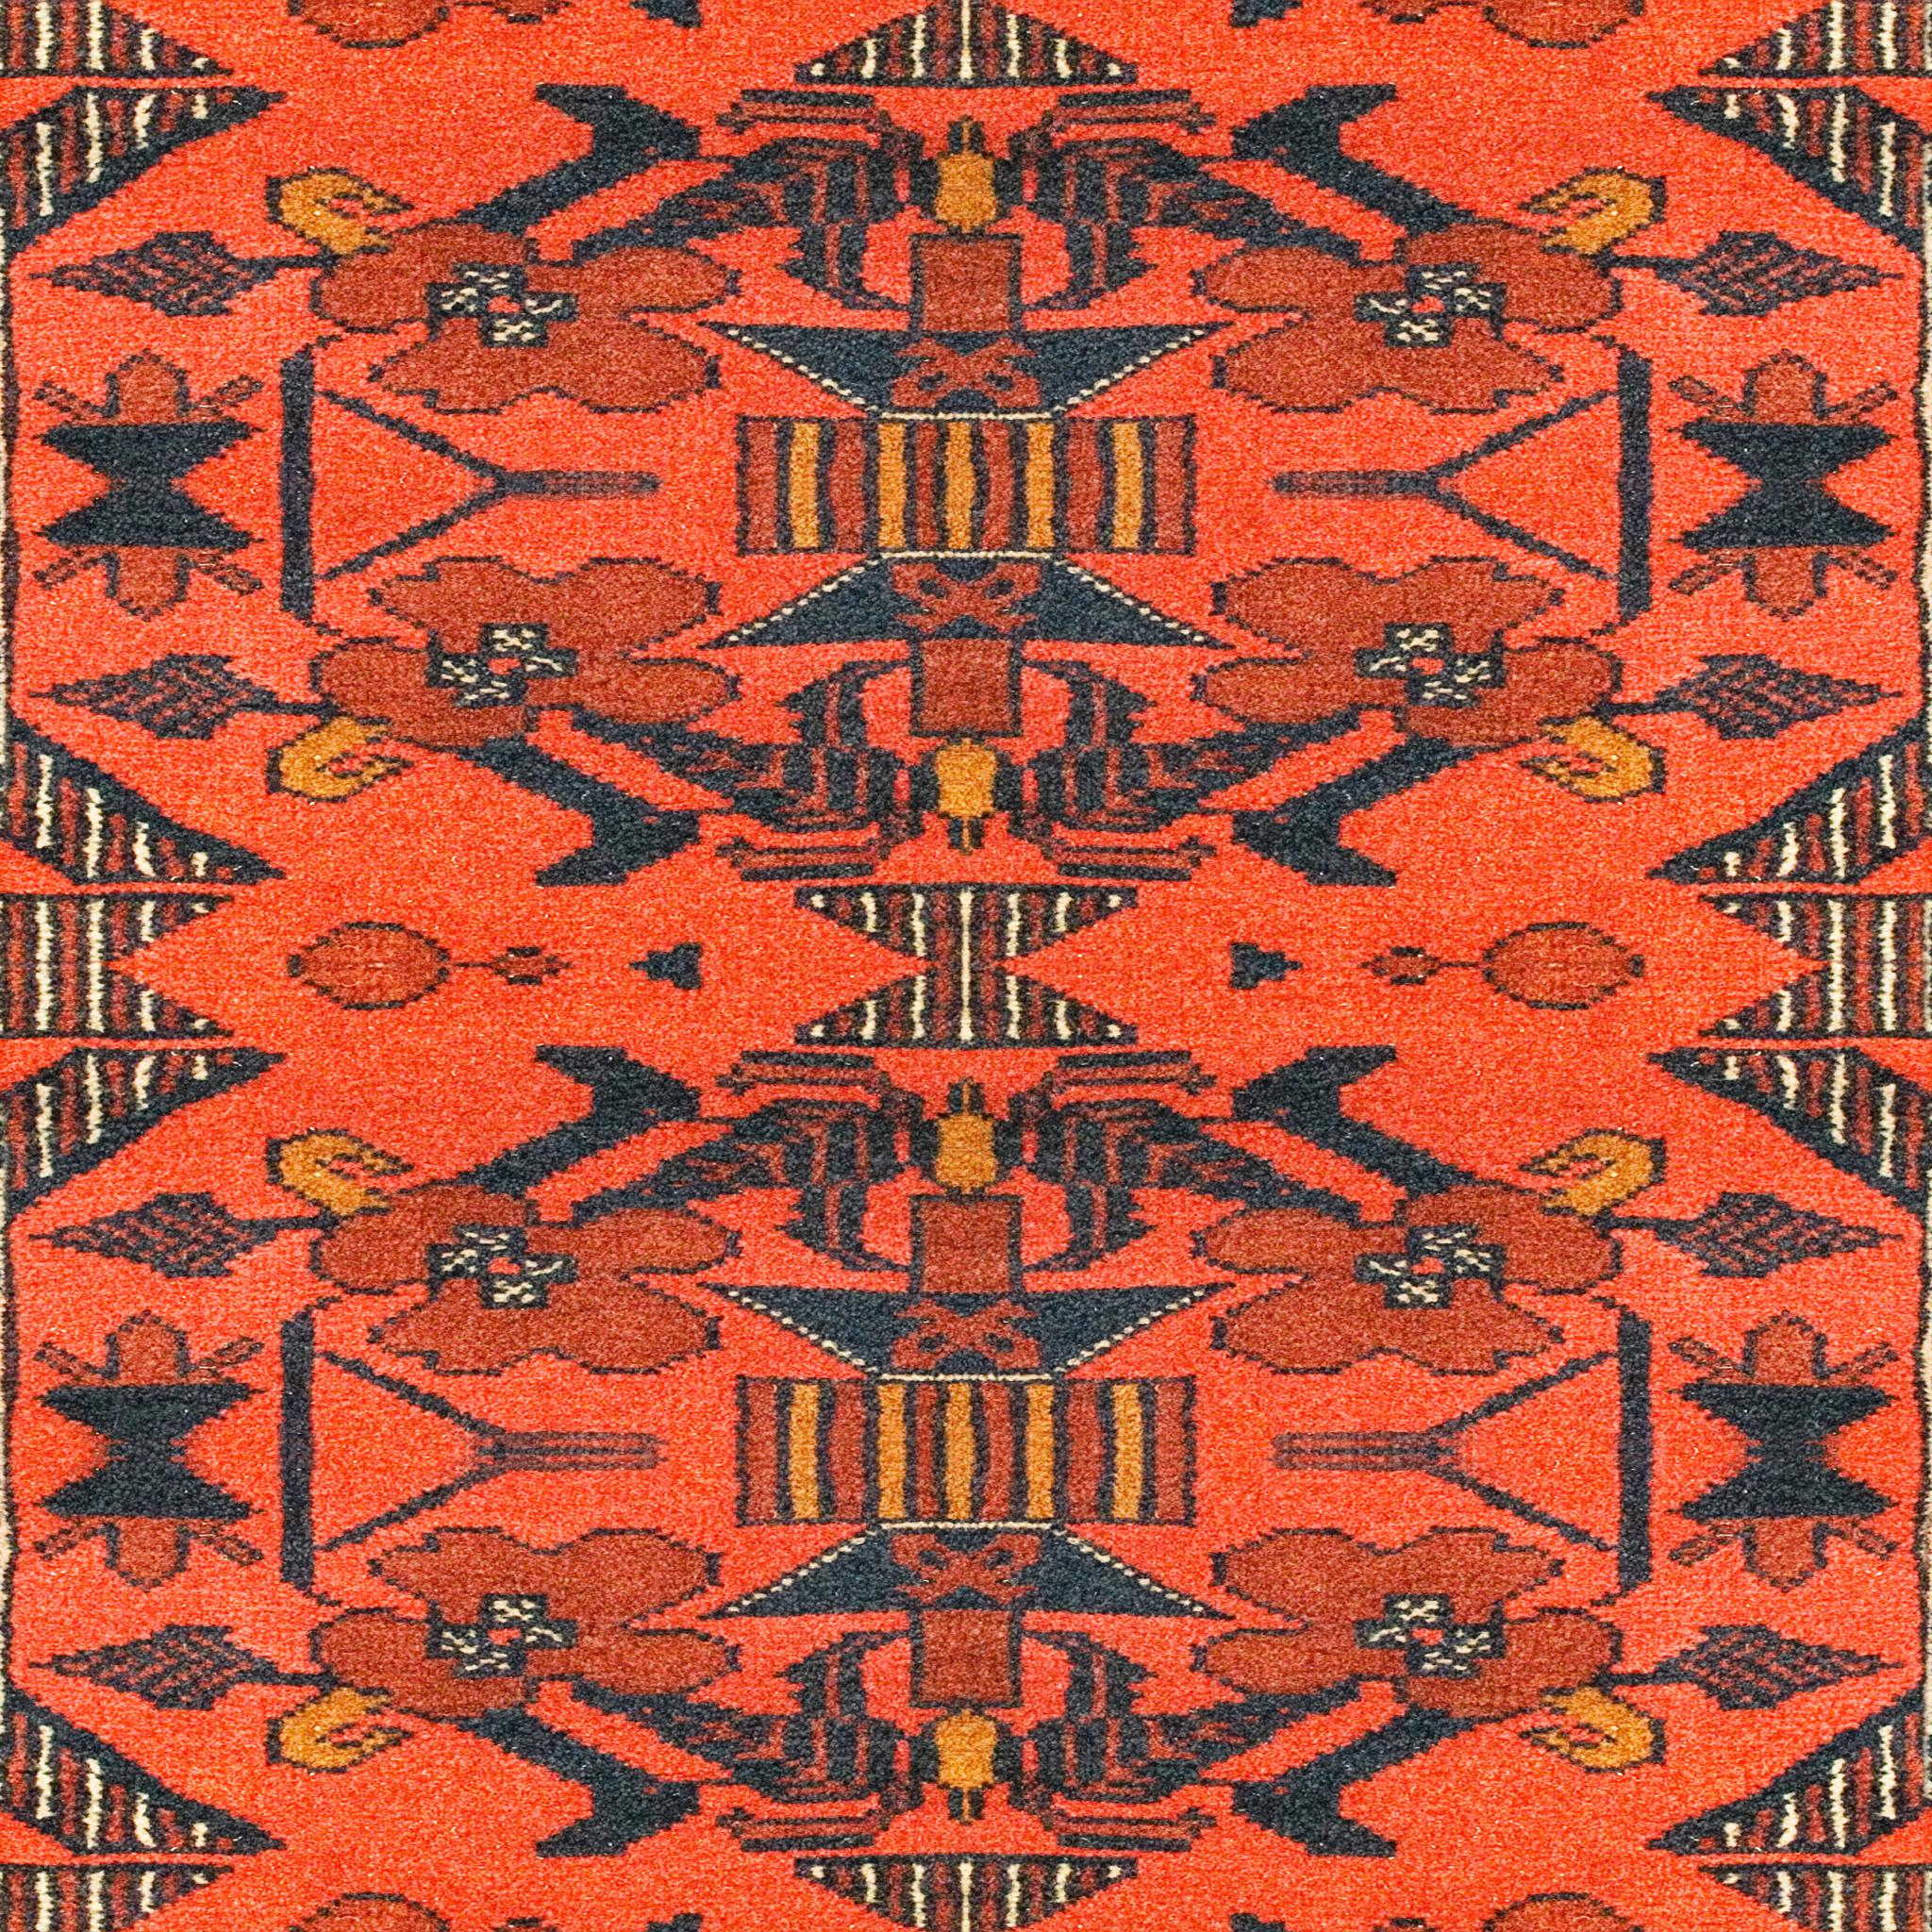 Egyptian Magic Carpet.jpg